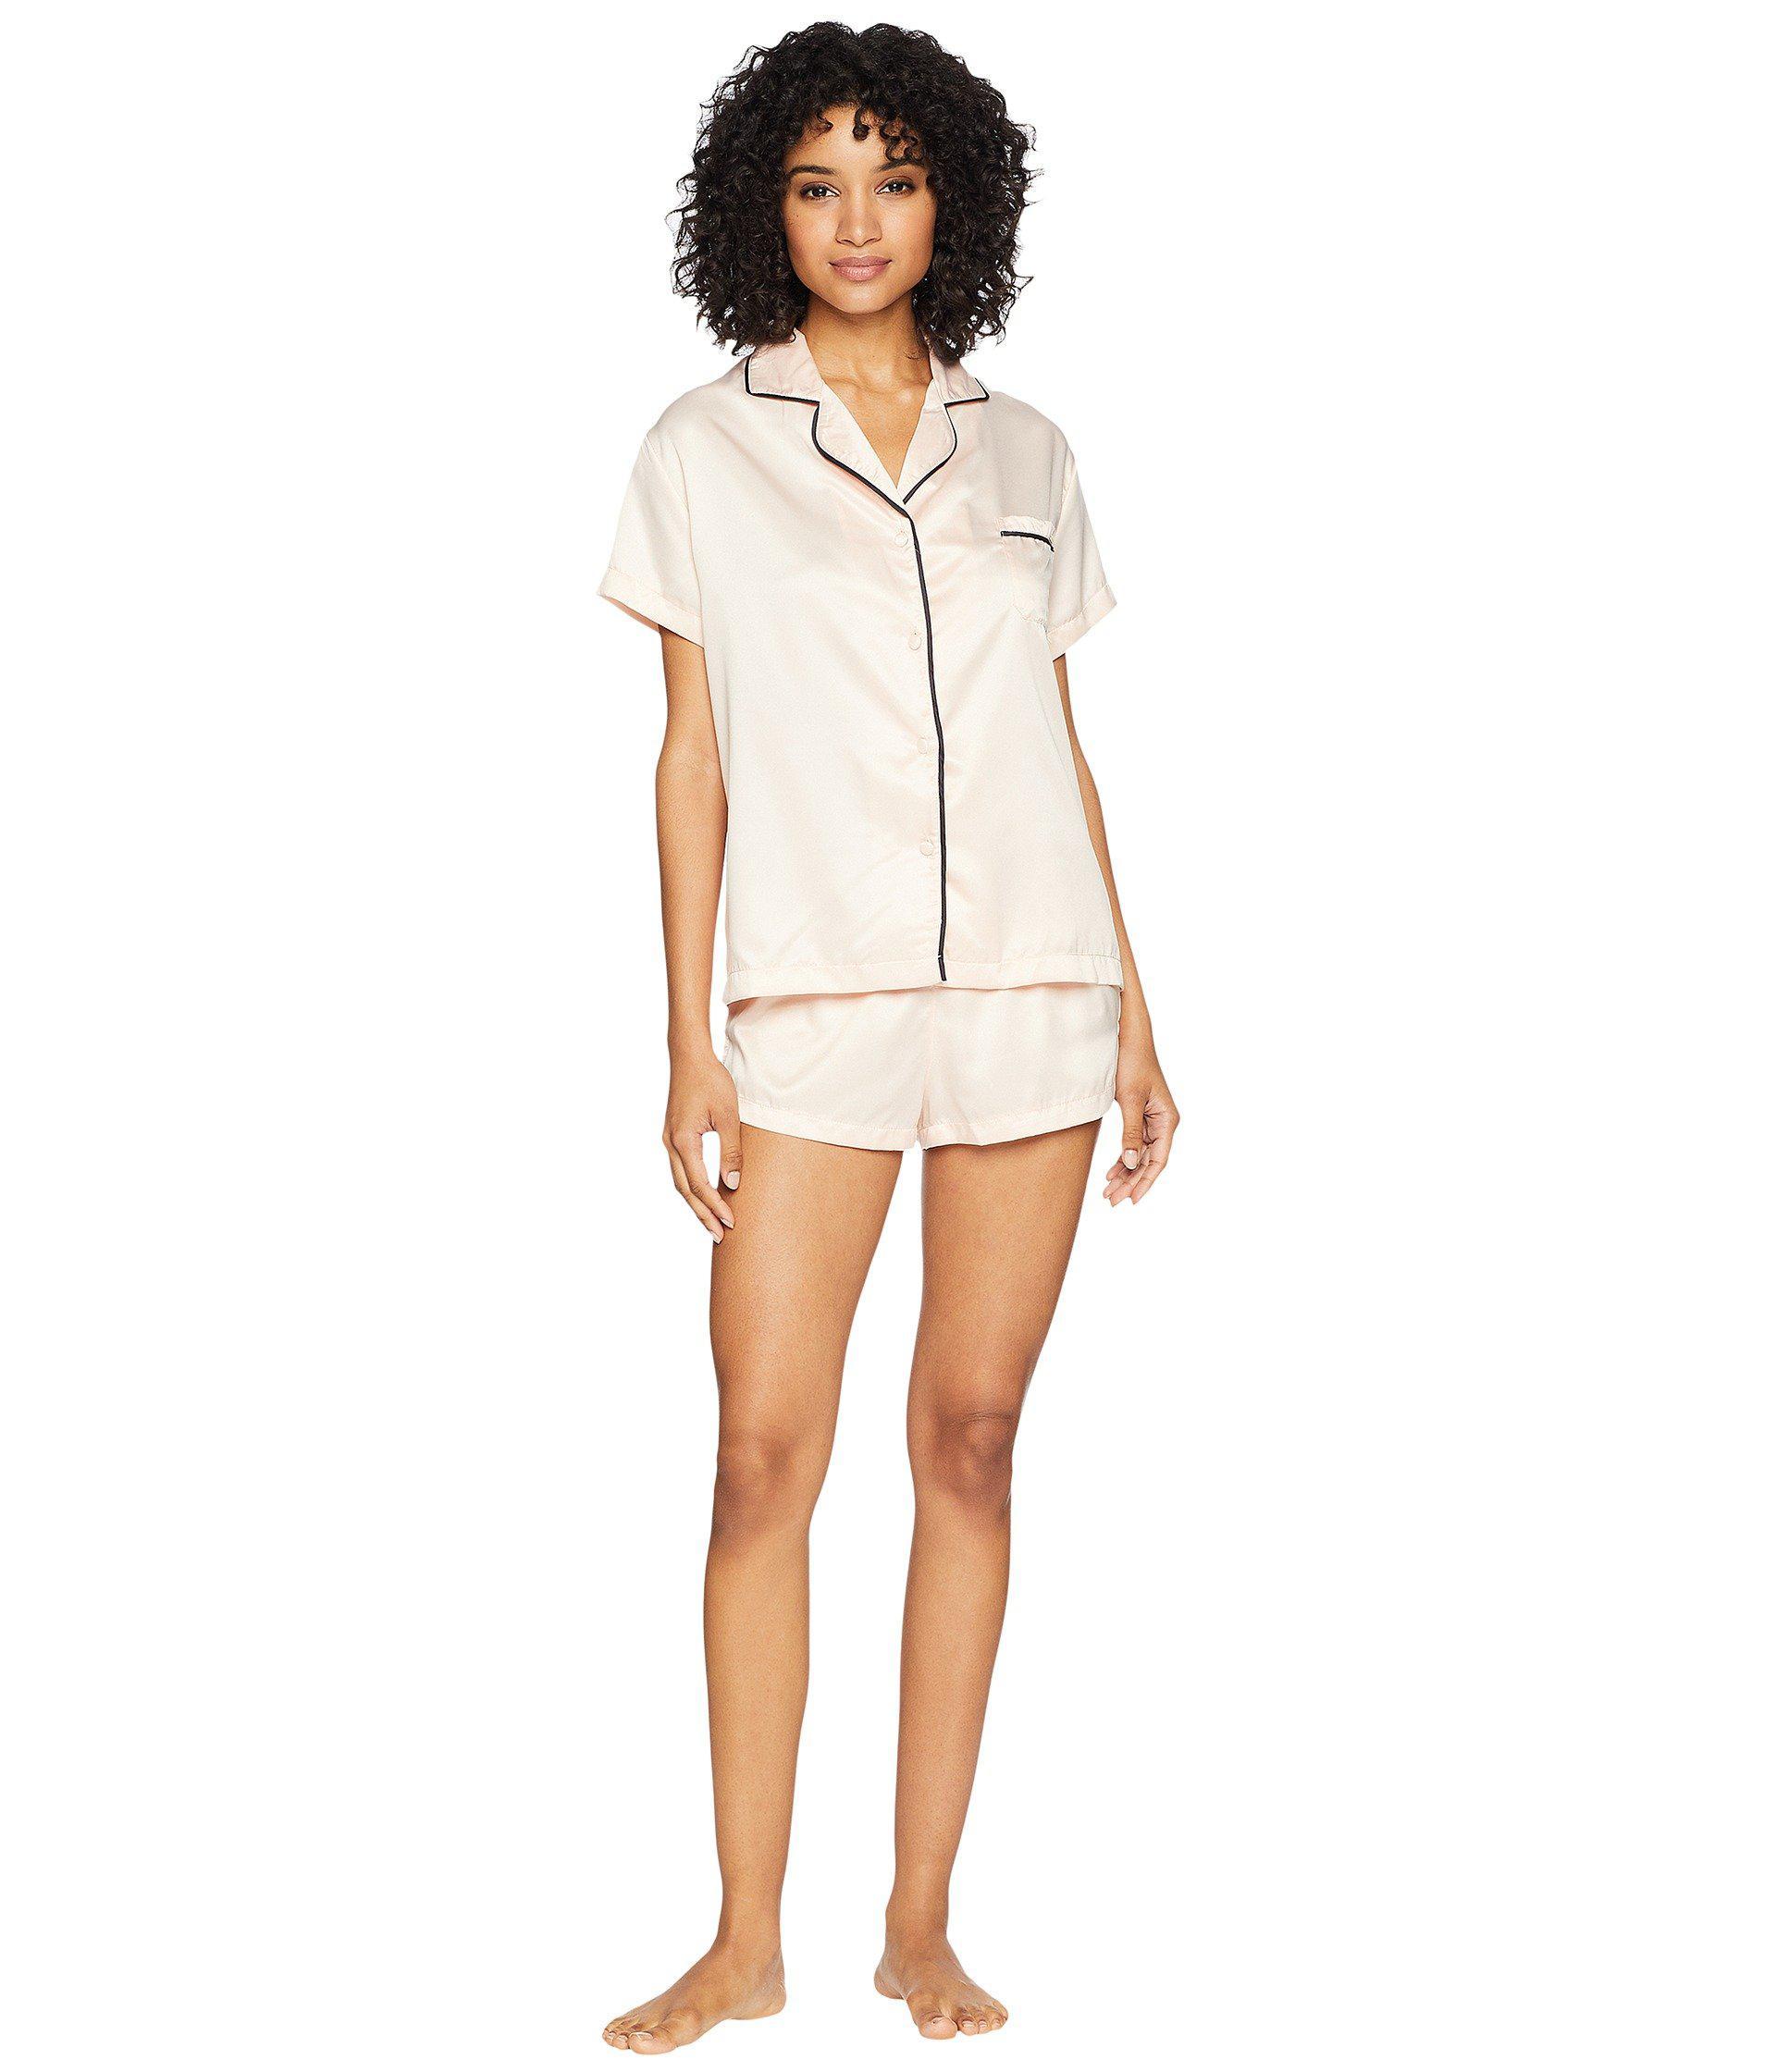 ffe4ffcaa65 Womens Shirt And Shorts Pajamas